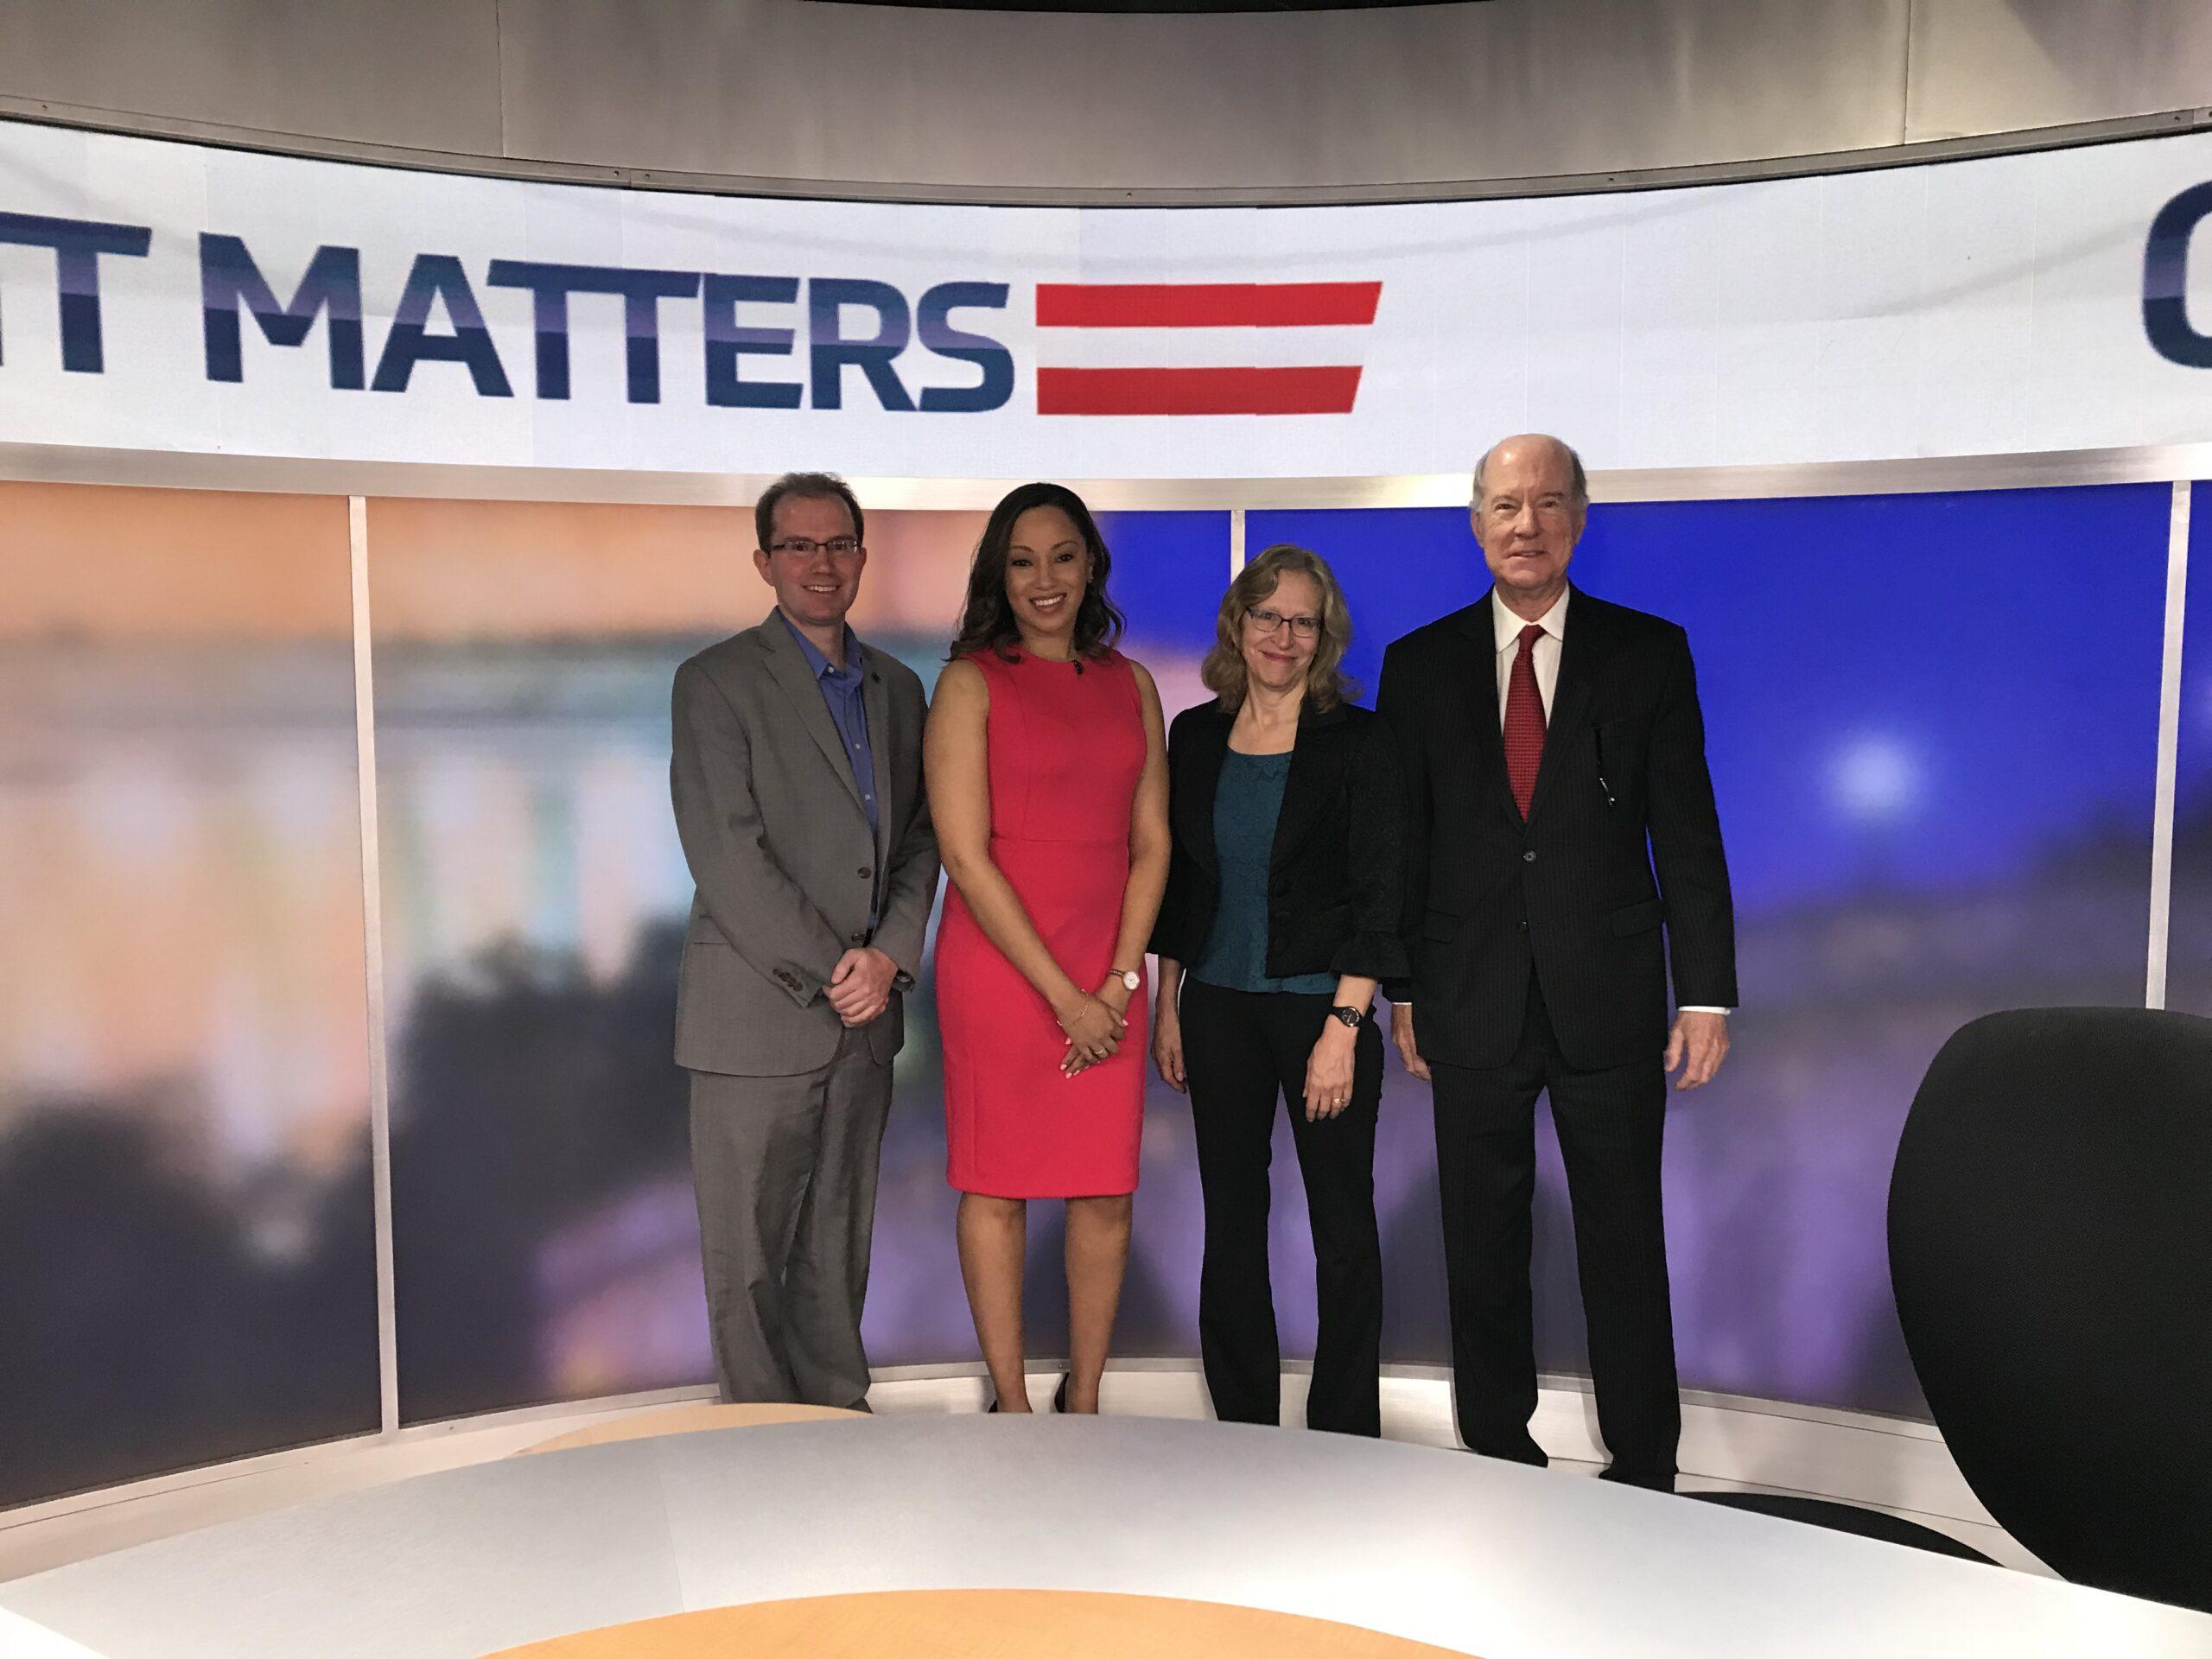 Molly Jahn, Greg Treverton Government Matters